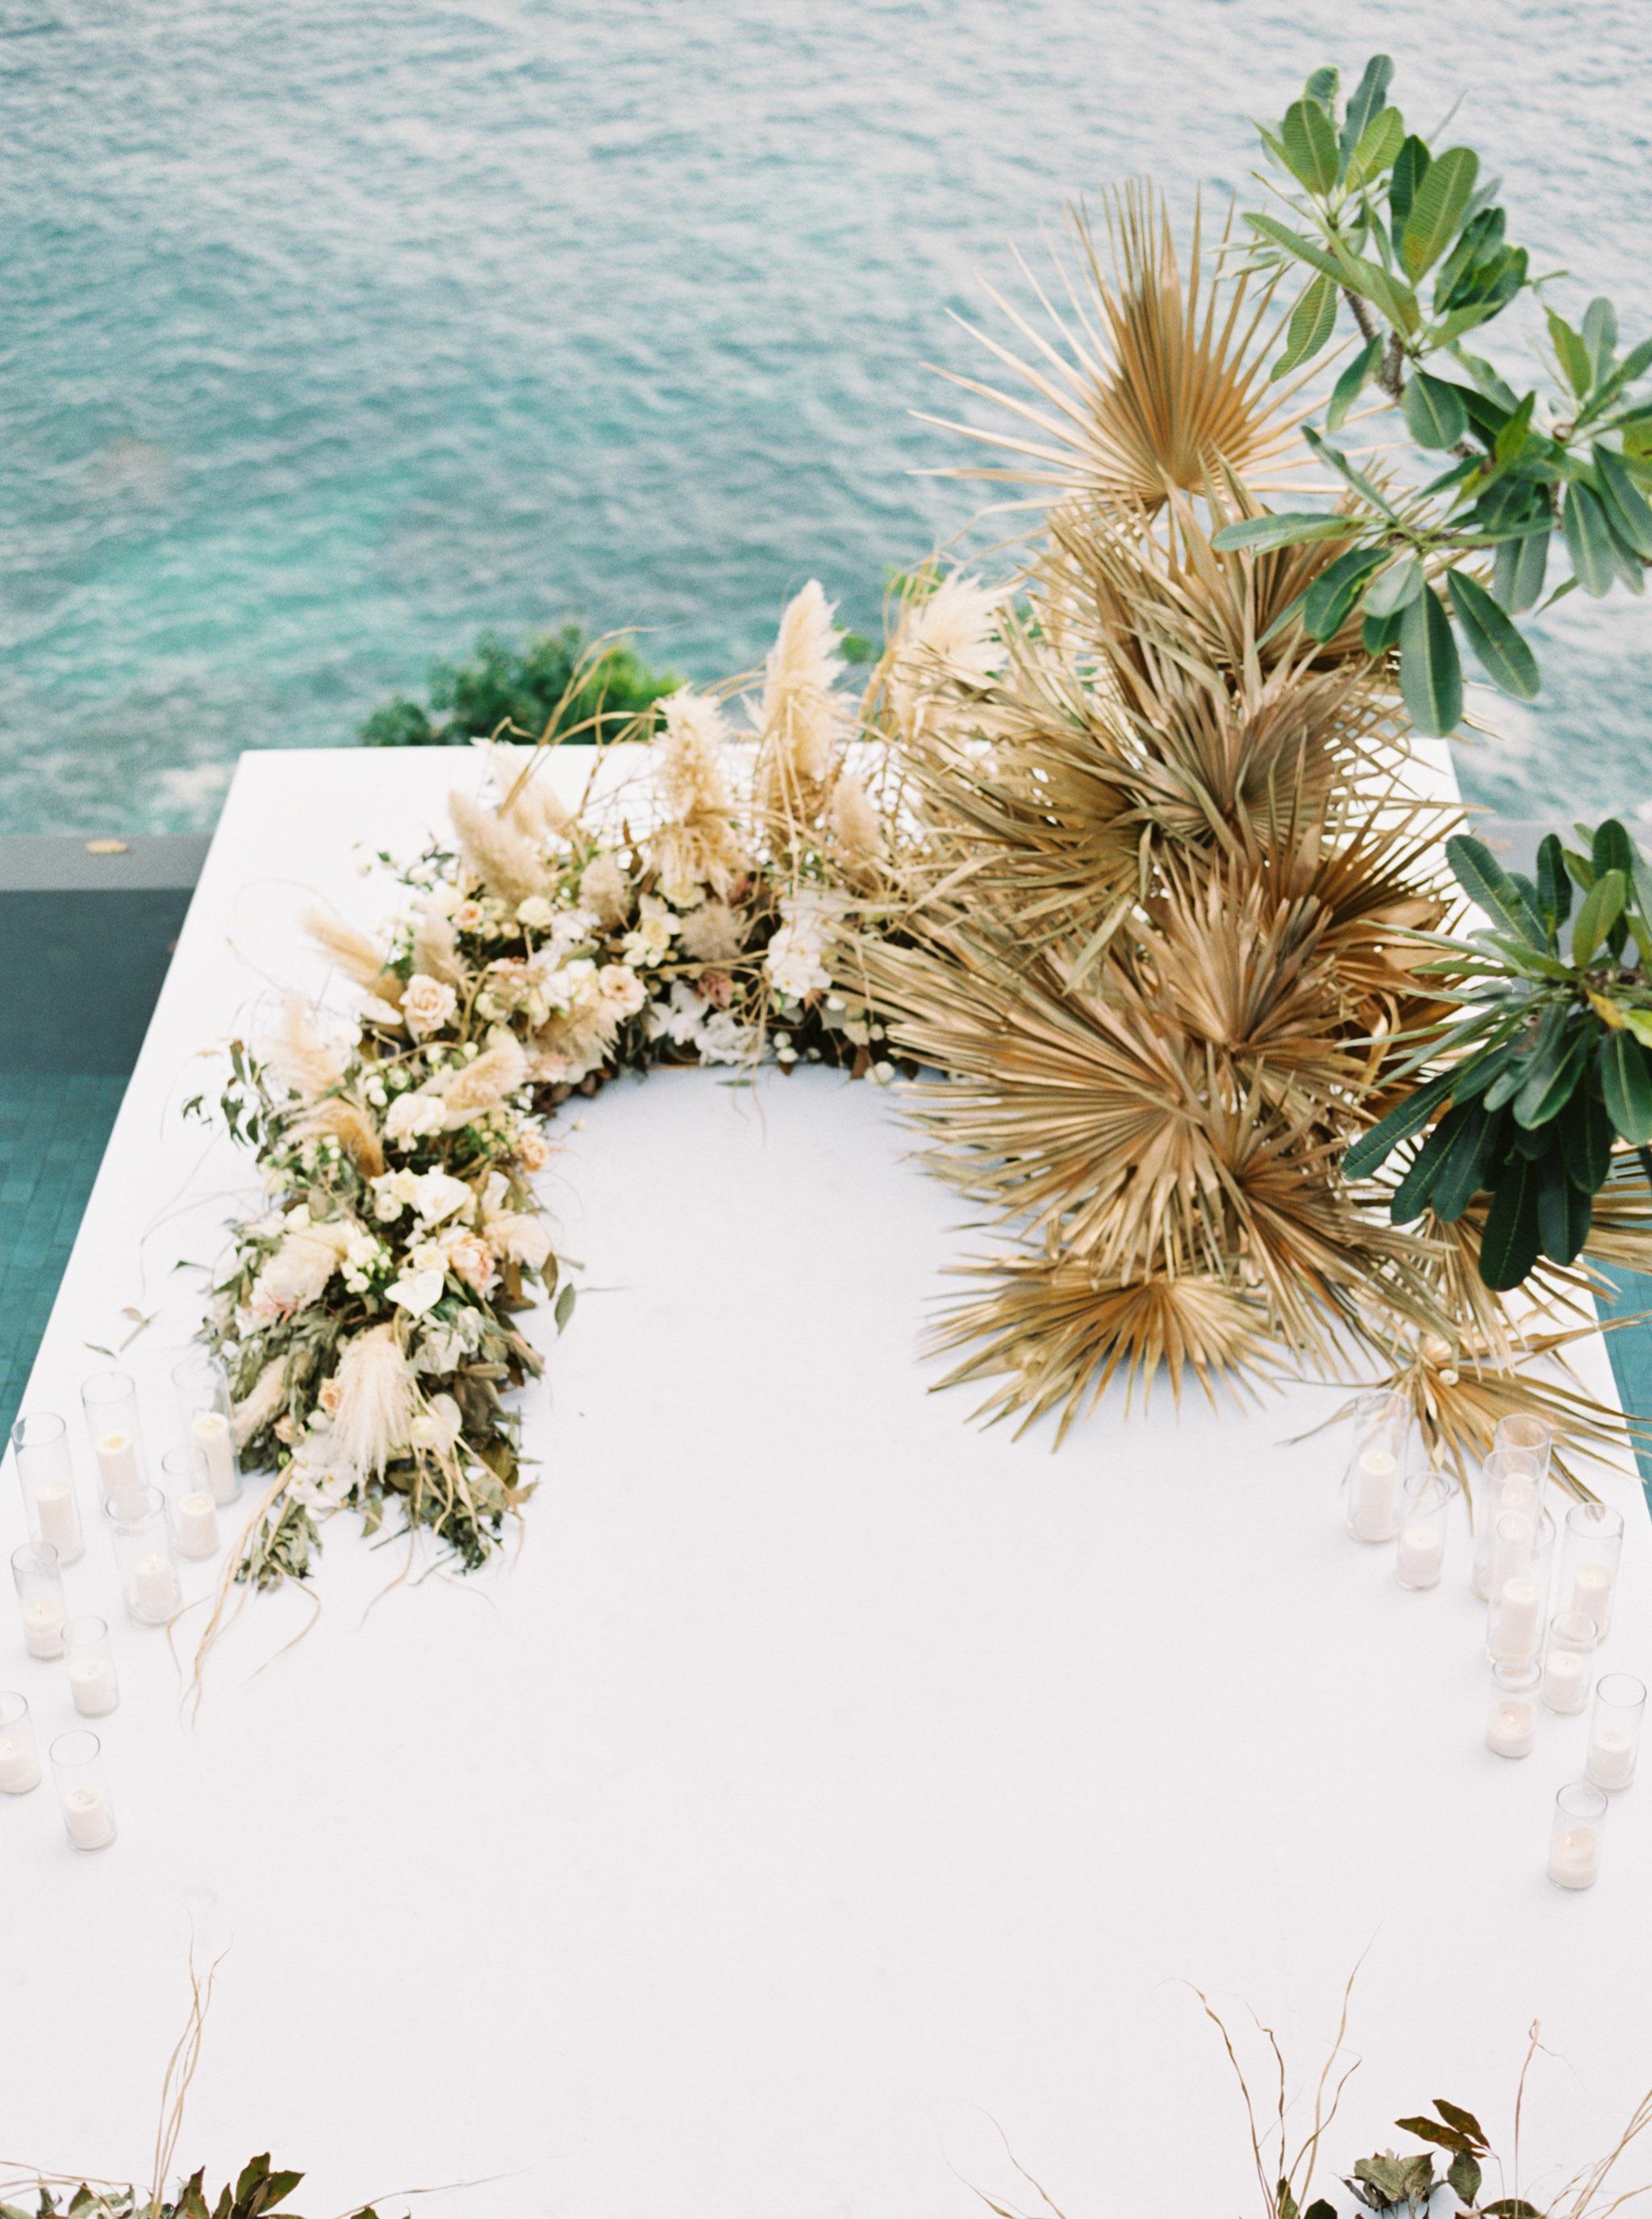 Destination Wedding at The Aquila Luxury Villas in Phuket Thailand Fine Art Film Wedding Photographer Sheri McMahon-00012-12.jpg